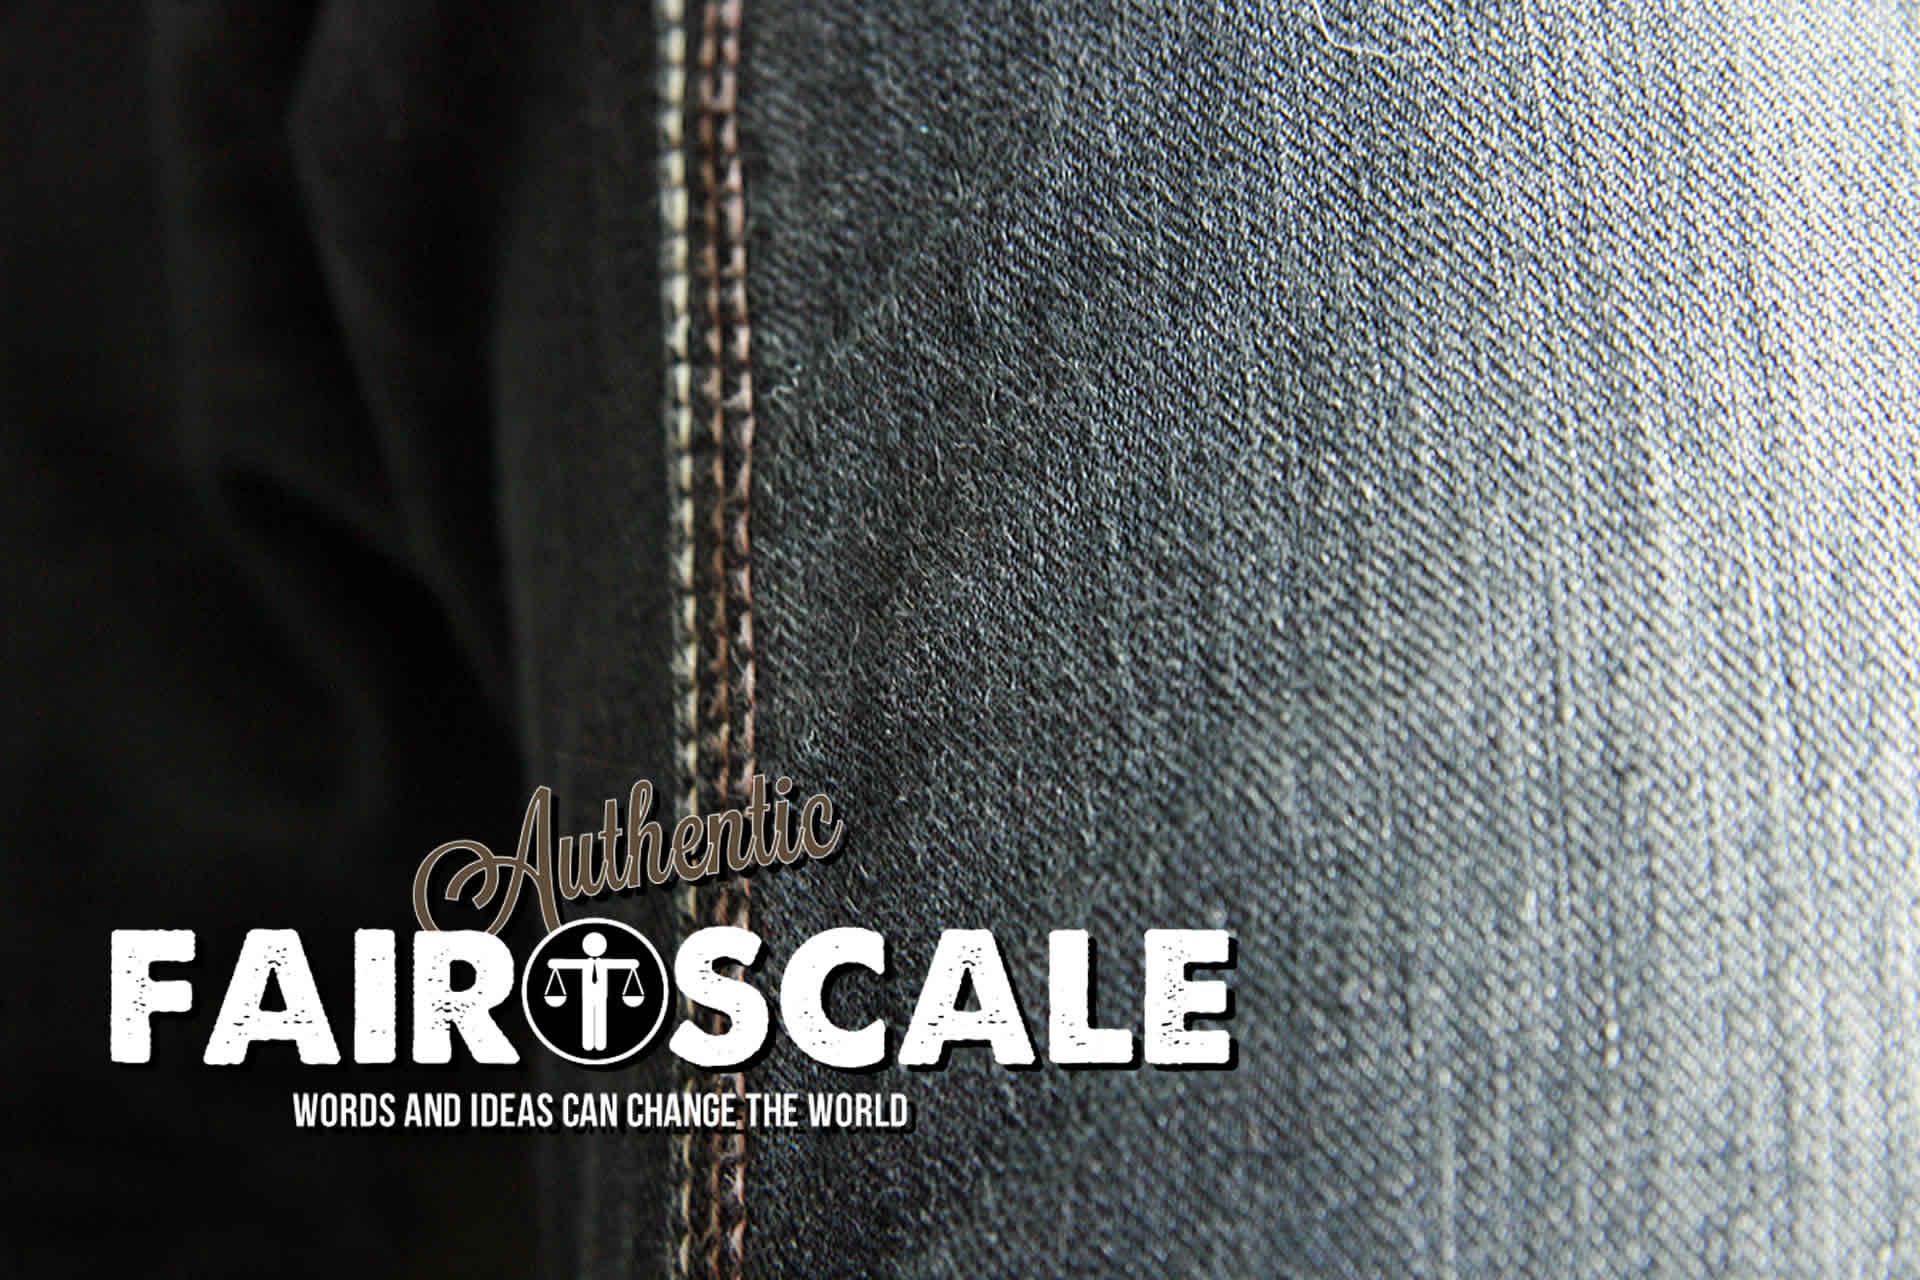 Fairscale Logo auf Jeans